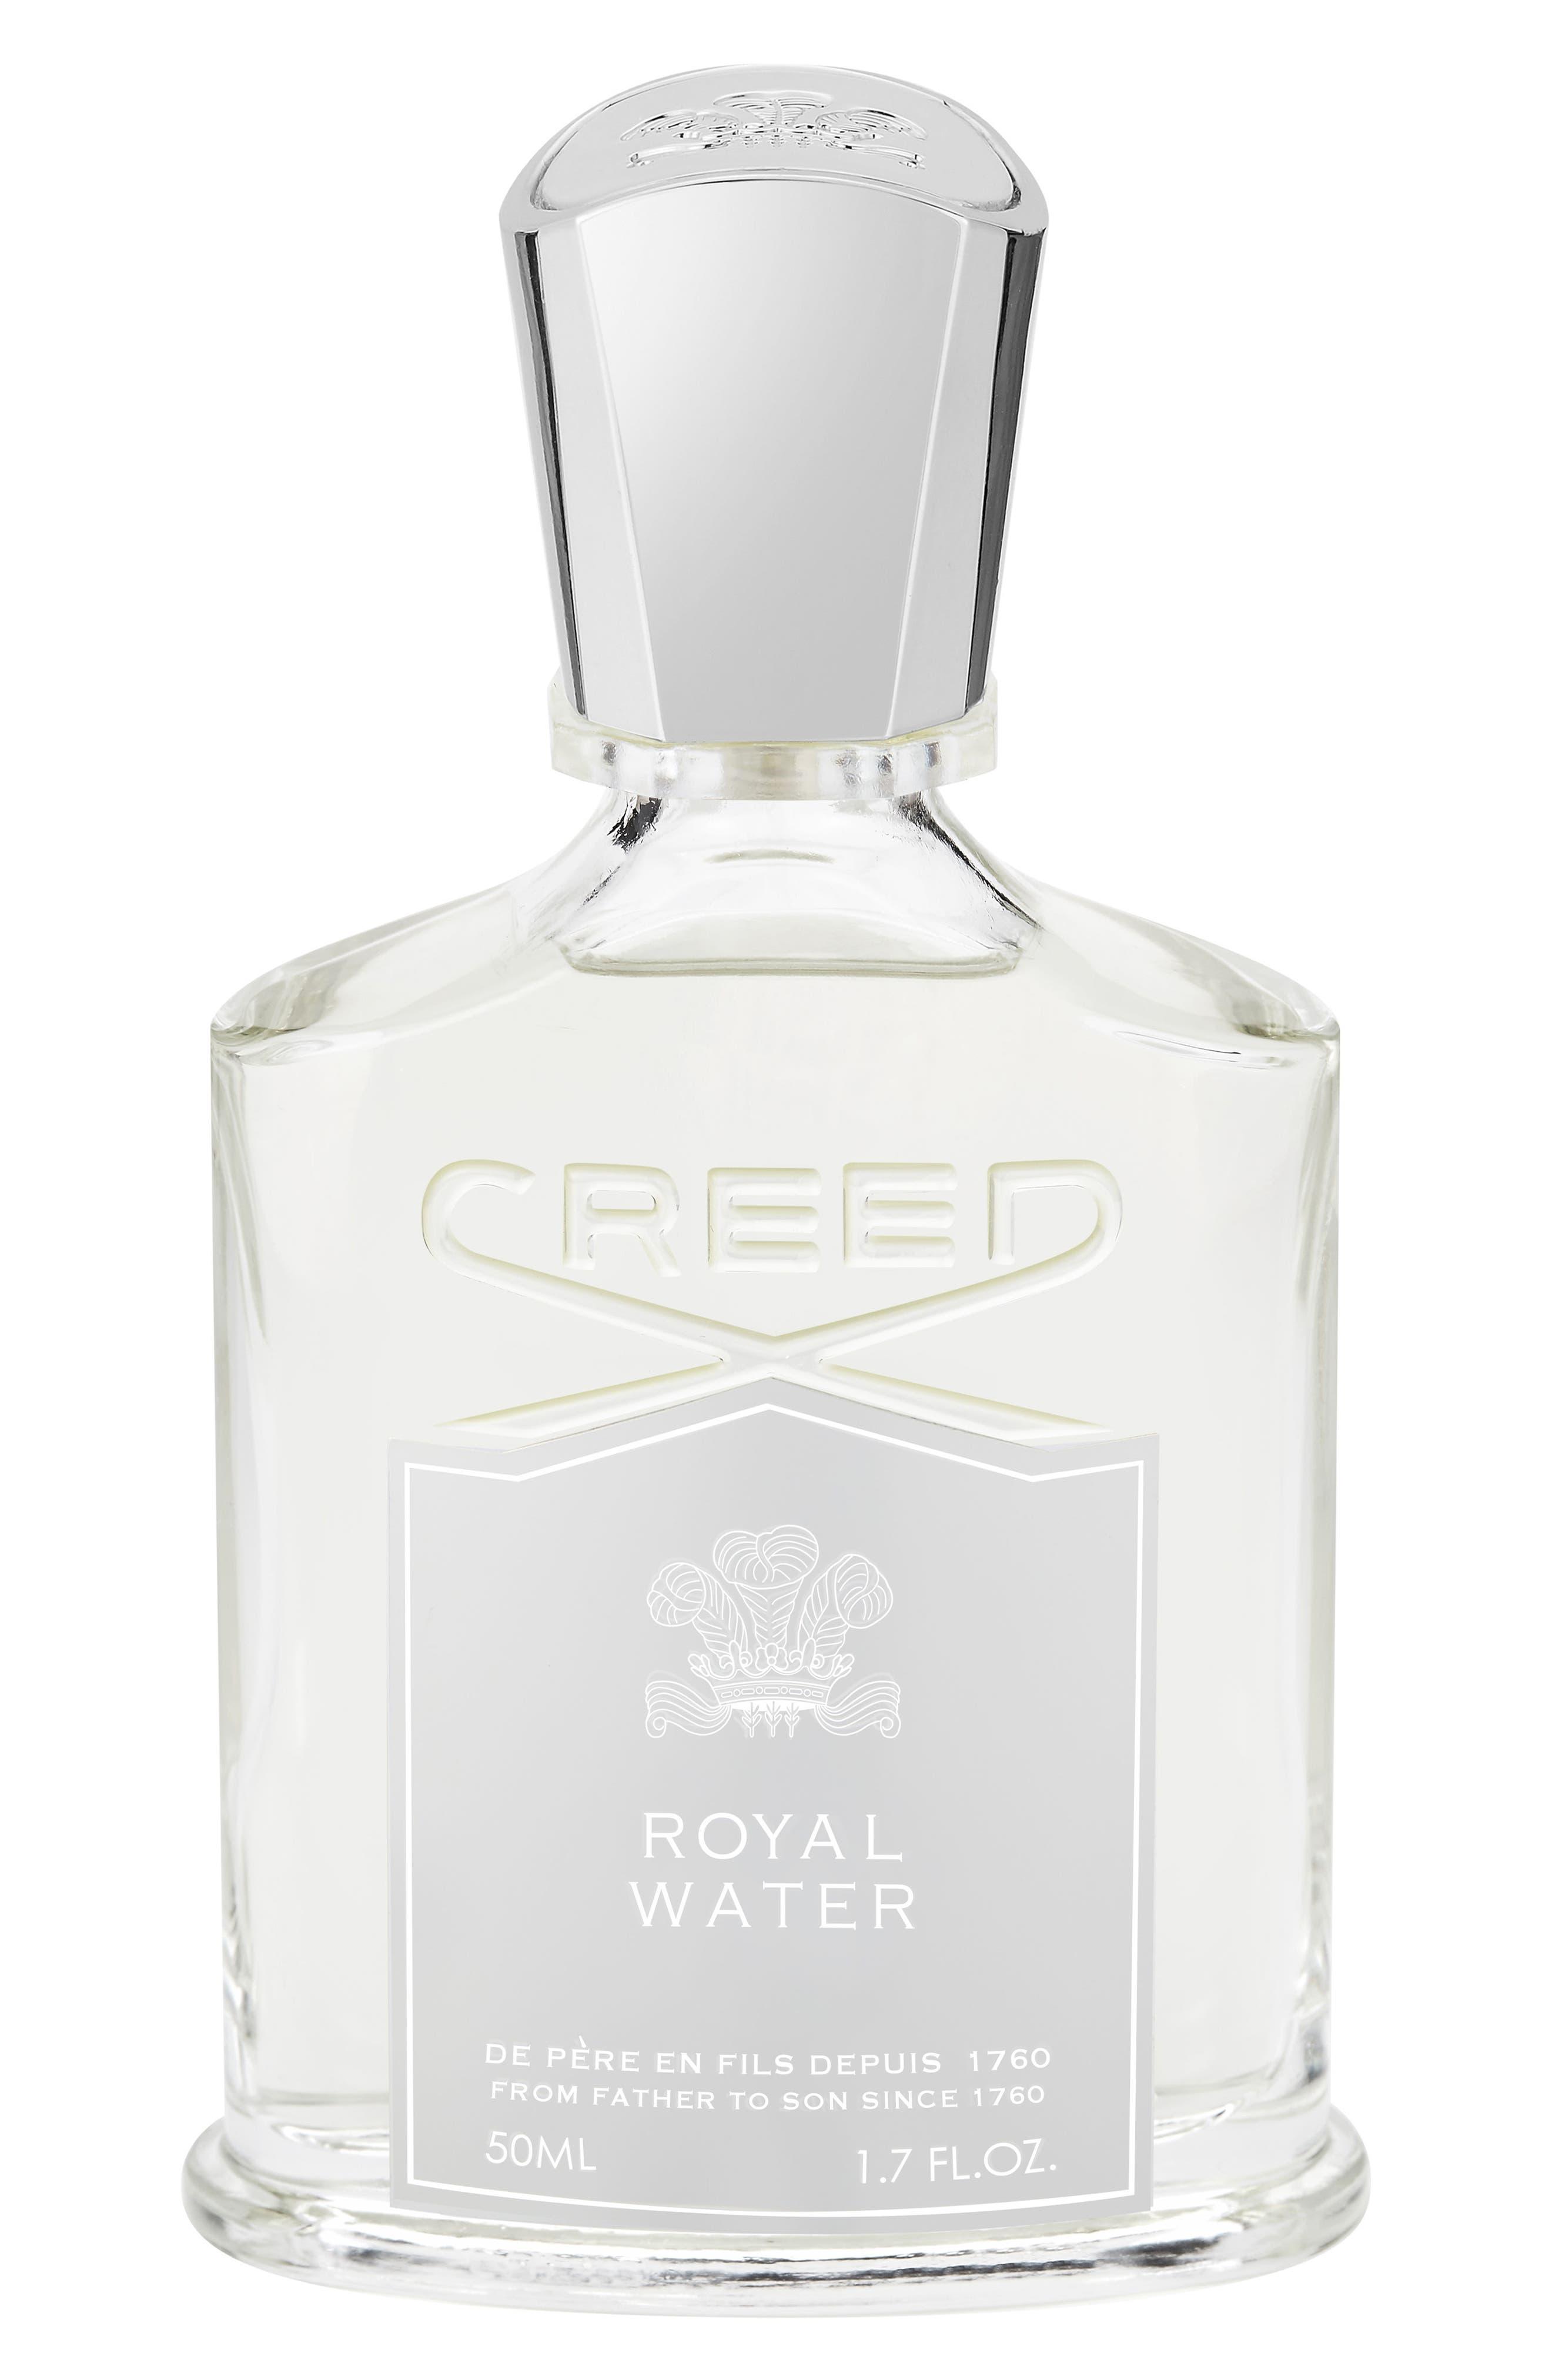 Main Image - Creed Travel Size Royal Water Fragrance